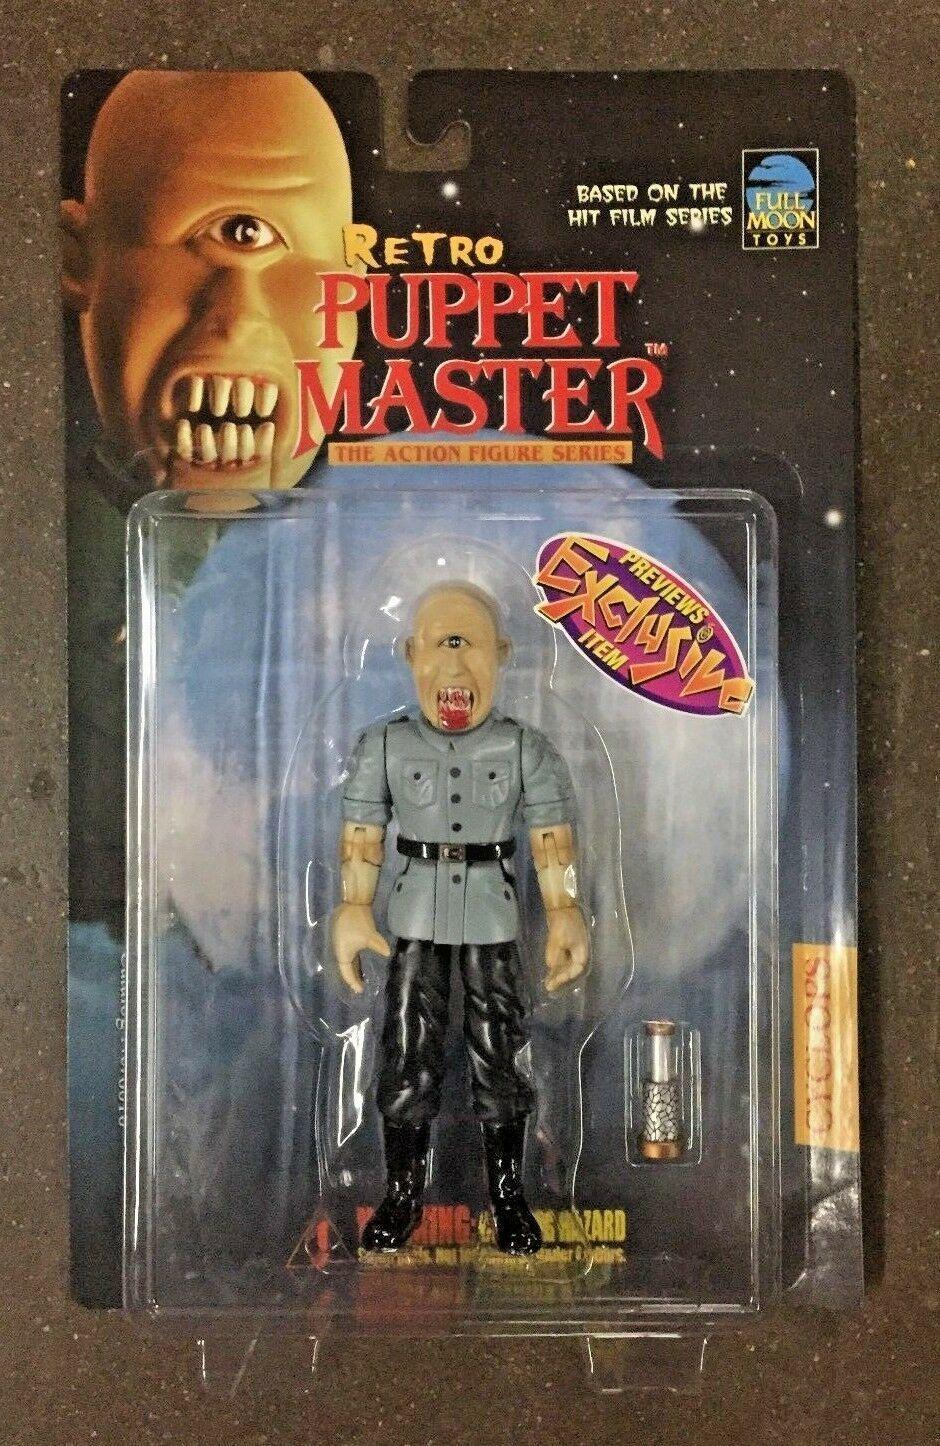 Full Moon Juguetes 1999 Retro Puppet Master vistas previas Exc Blade & Cíclope figura Set